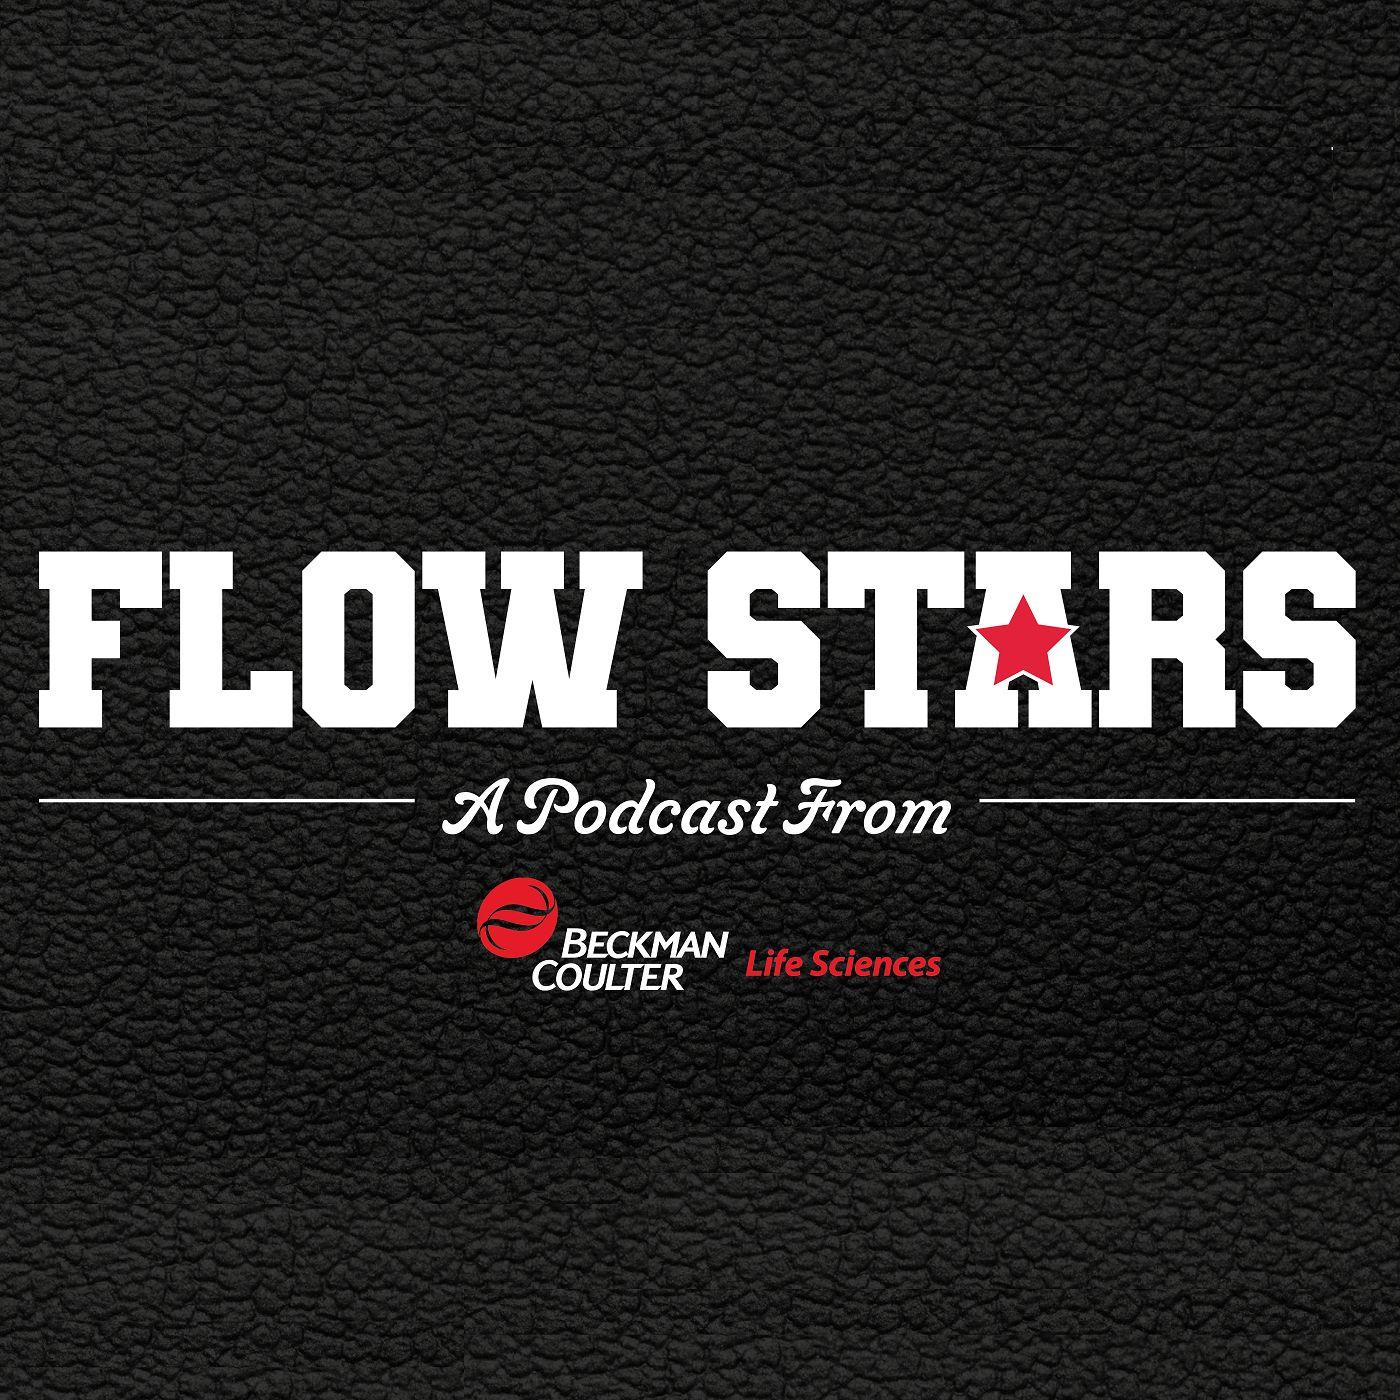 FlowStars